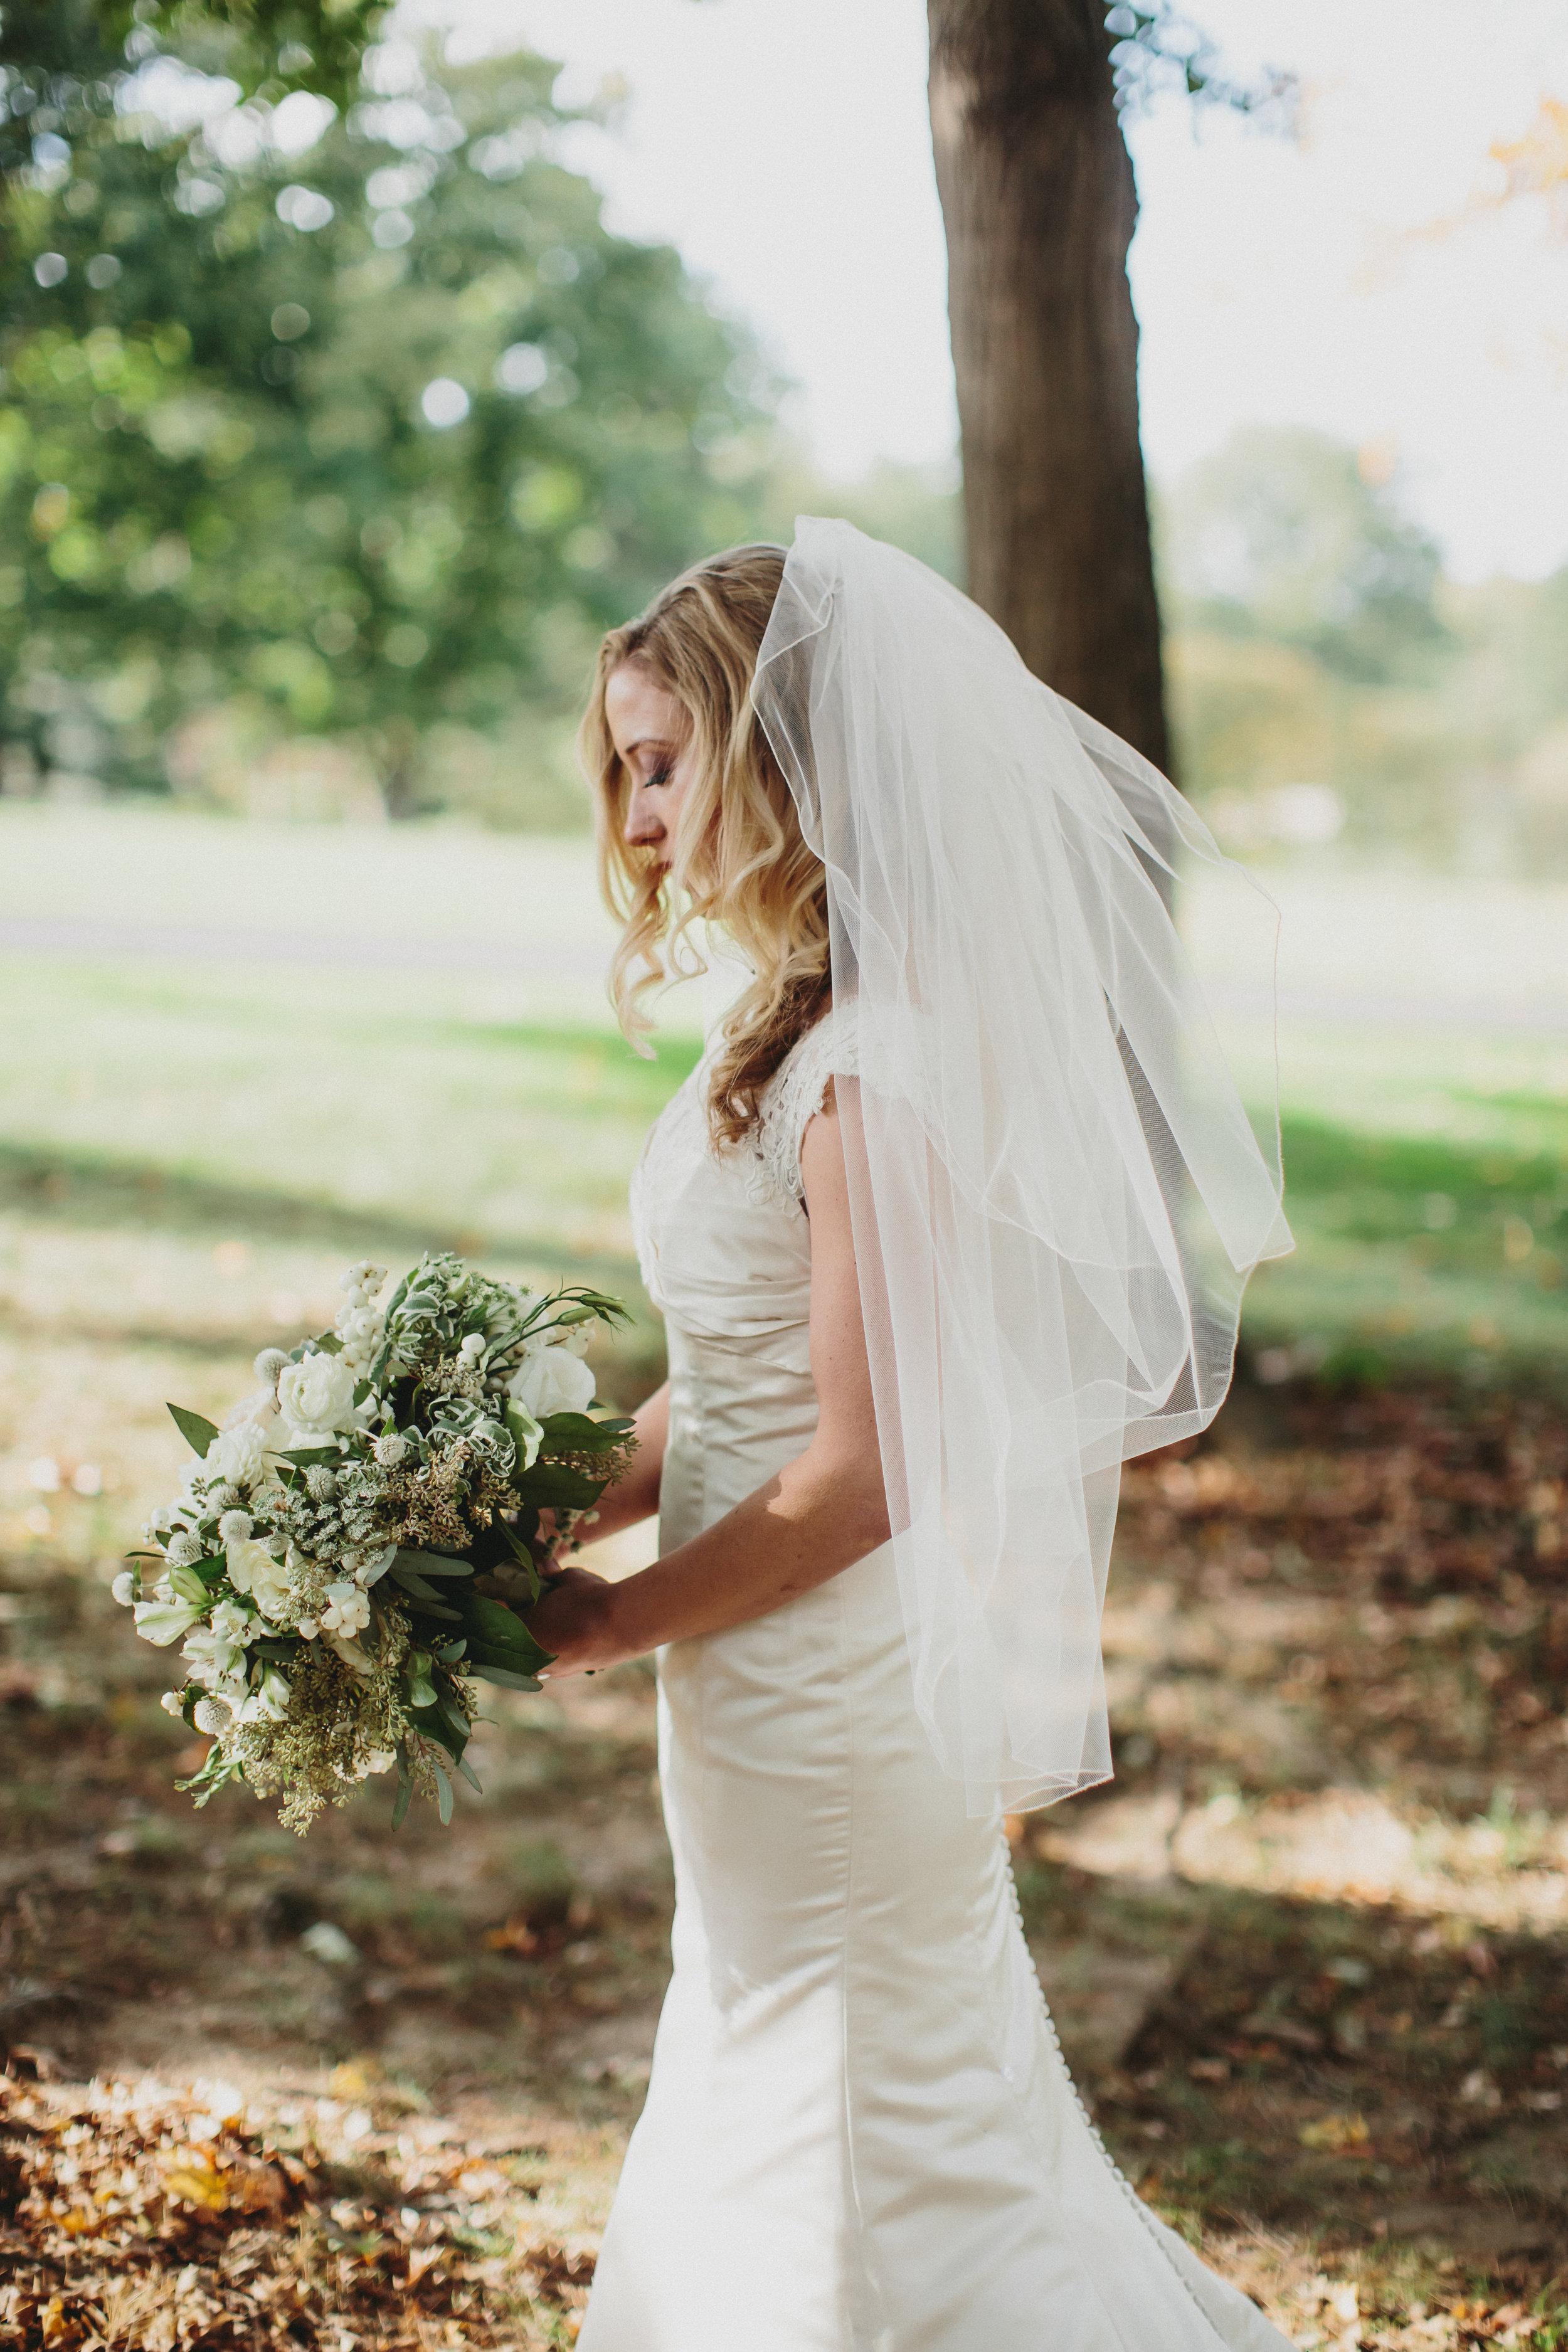 the_carrs_photography_katie_matt_wedding_0340.jpg